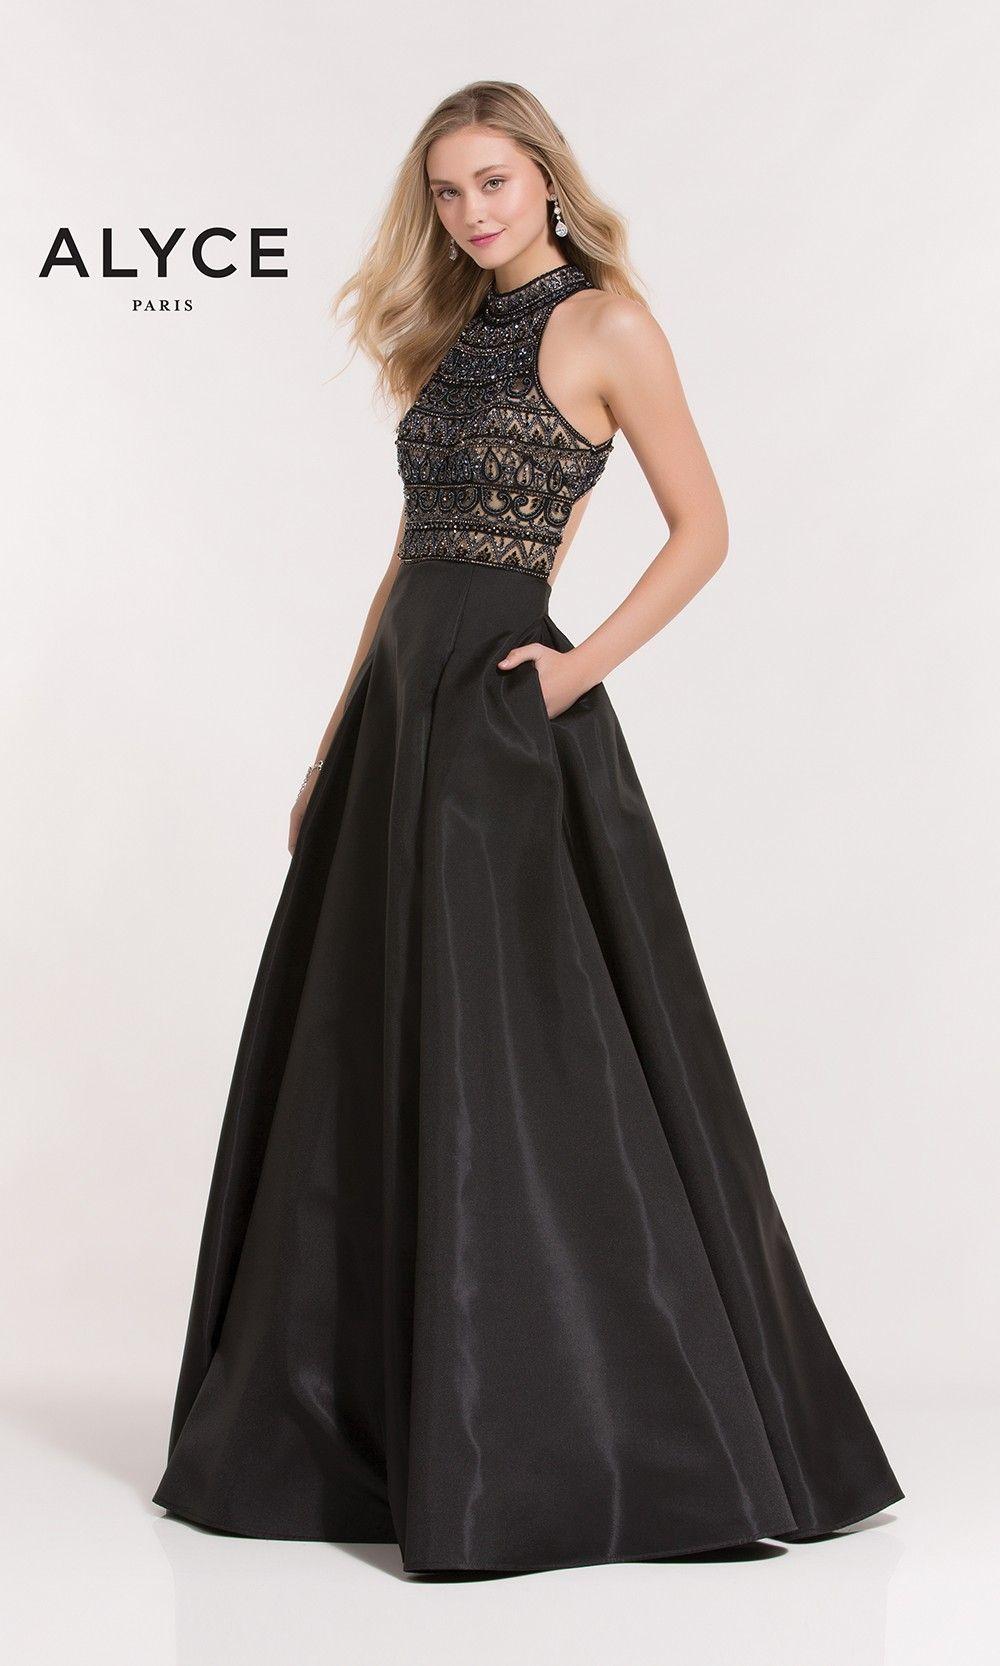 Alyce Paris Fall 2017 Long Dresses | Dress Style 6854 | Alyce Paris ...